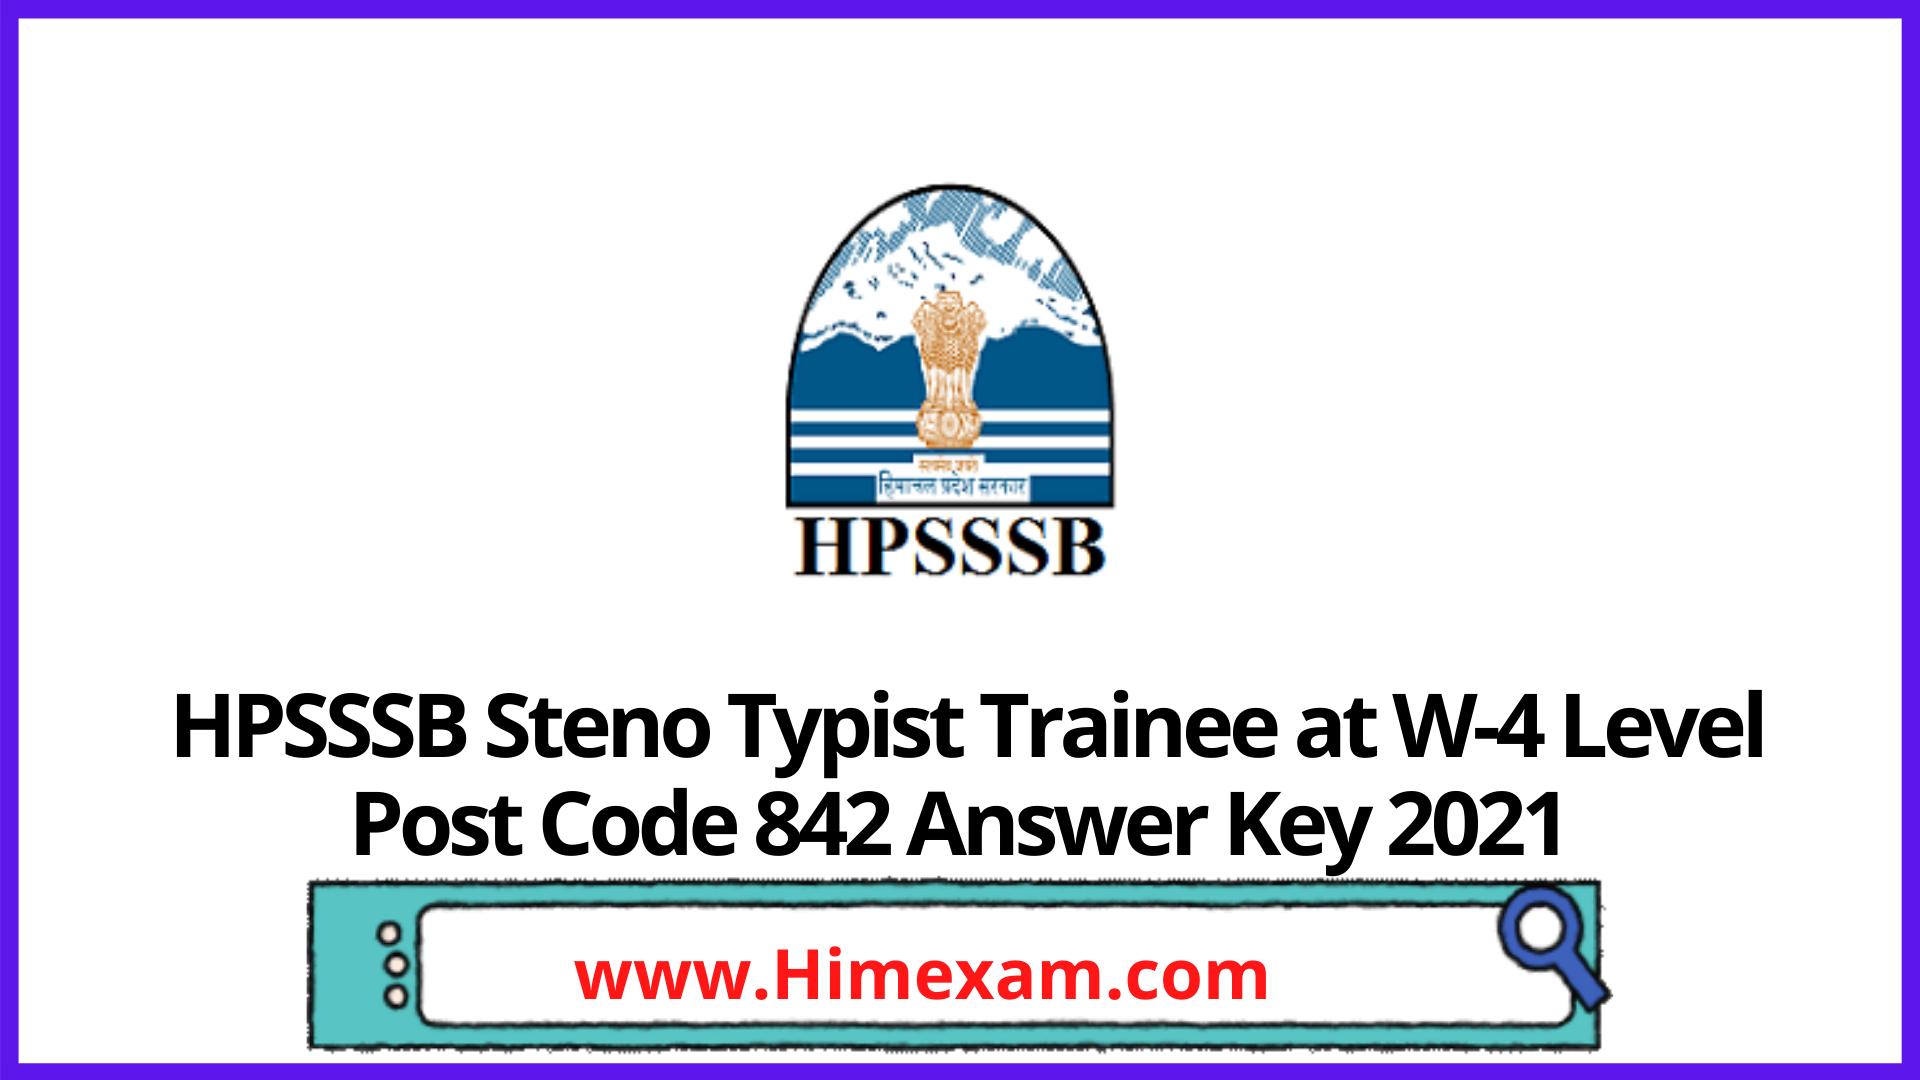 HPSSSB  Steno Typist Trainee at W-4 Level Post Code 842 Answer Key 2021